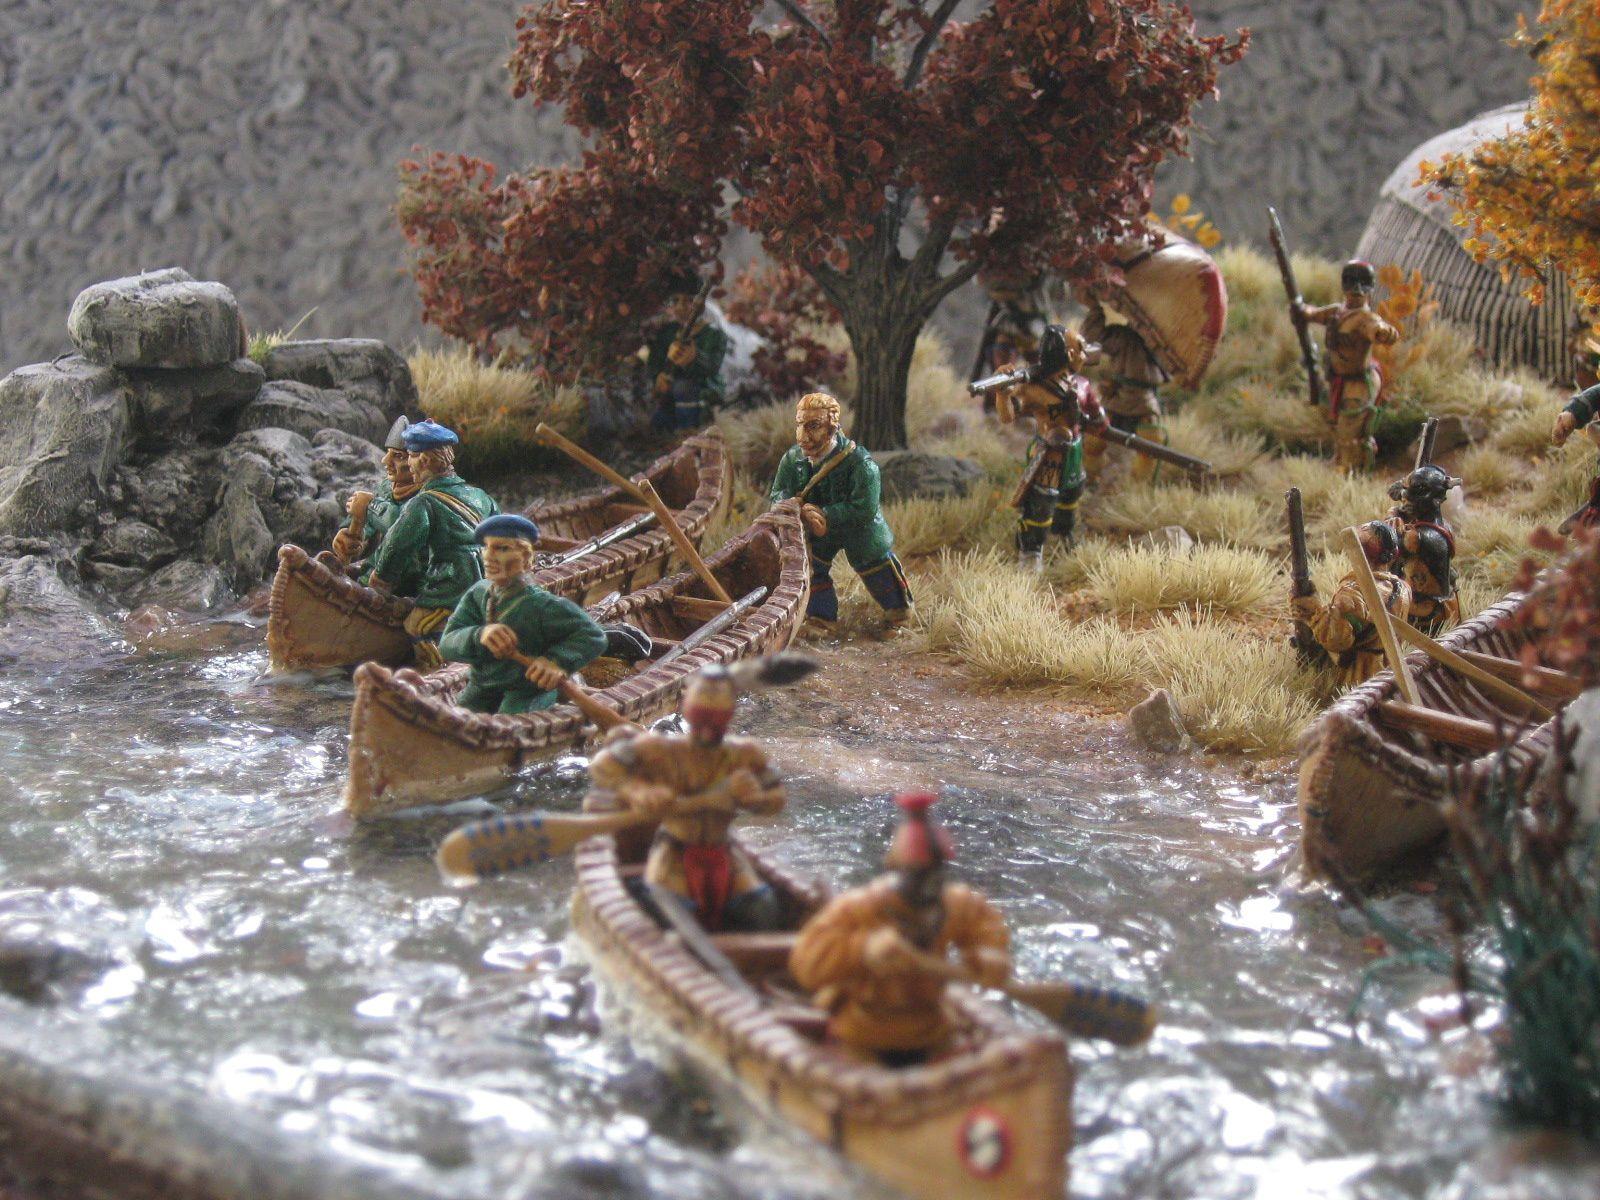 Groupe naval =10 hommes (6 indiens +4 rangers )